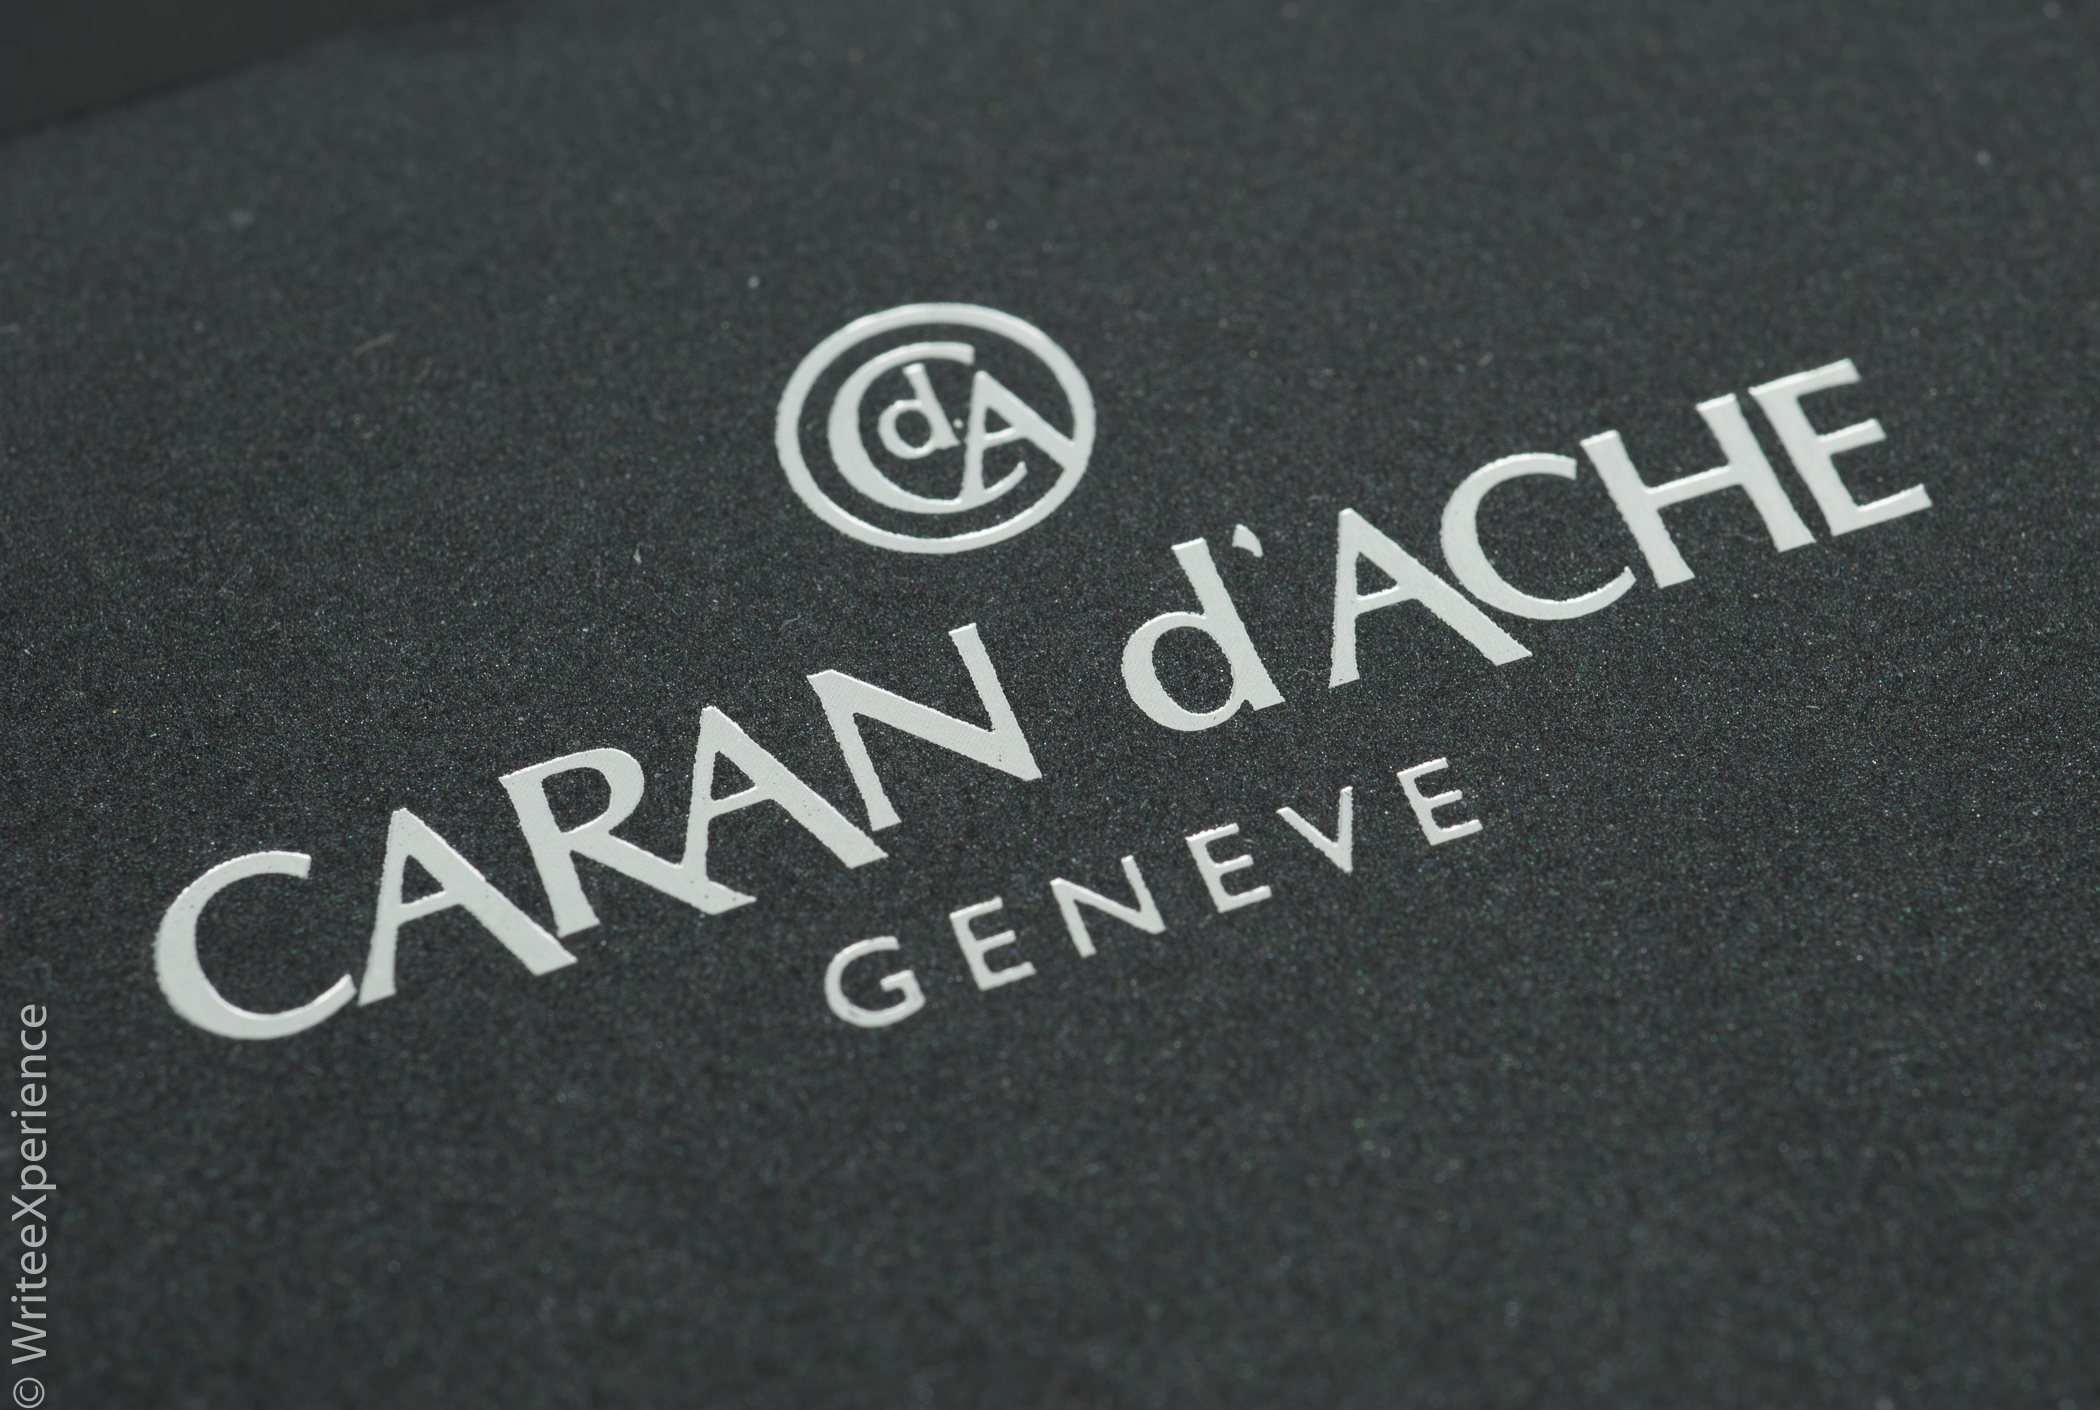 WriteeXperience-Caran-dache-noblewood-pencils-5th-3.jpg